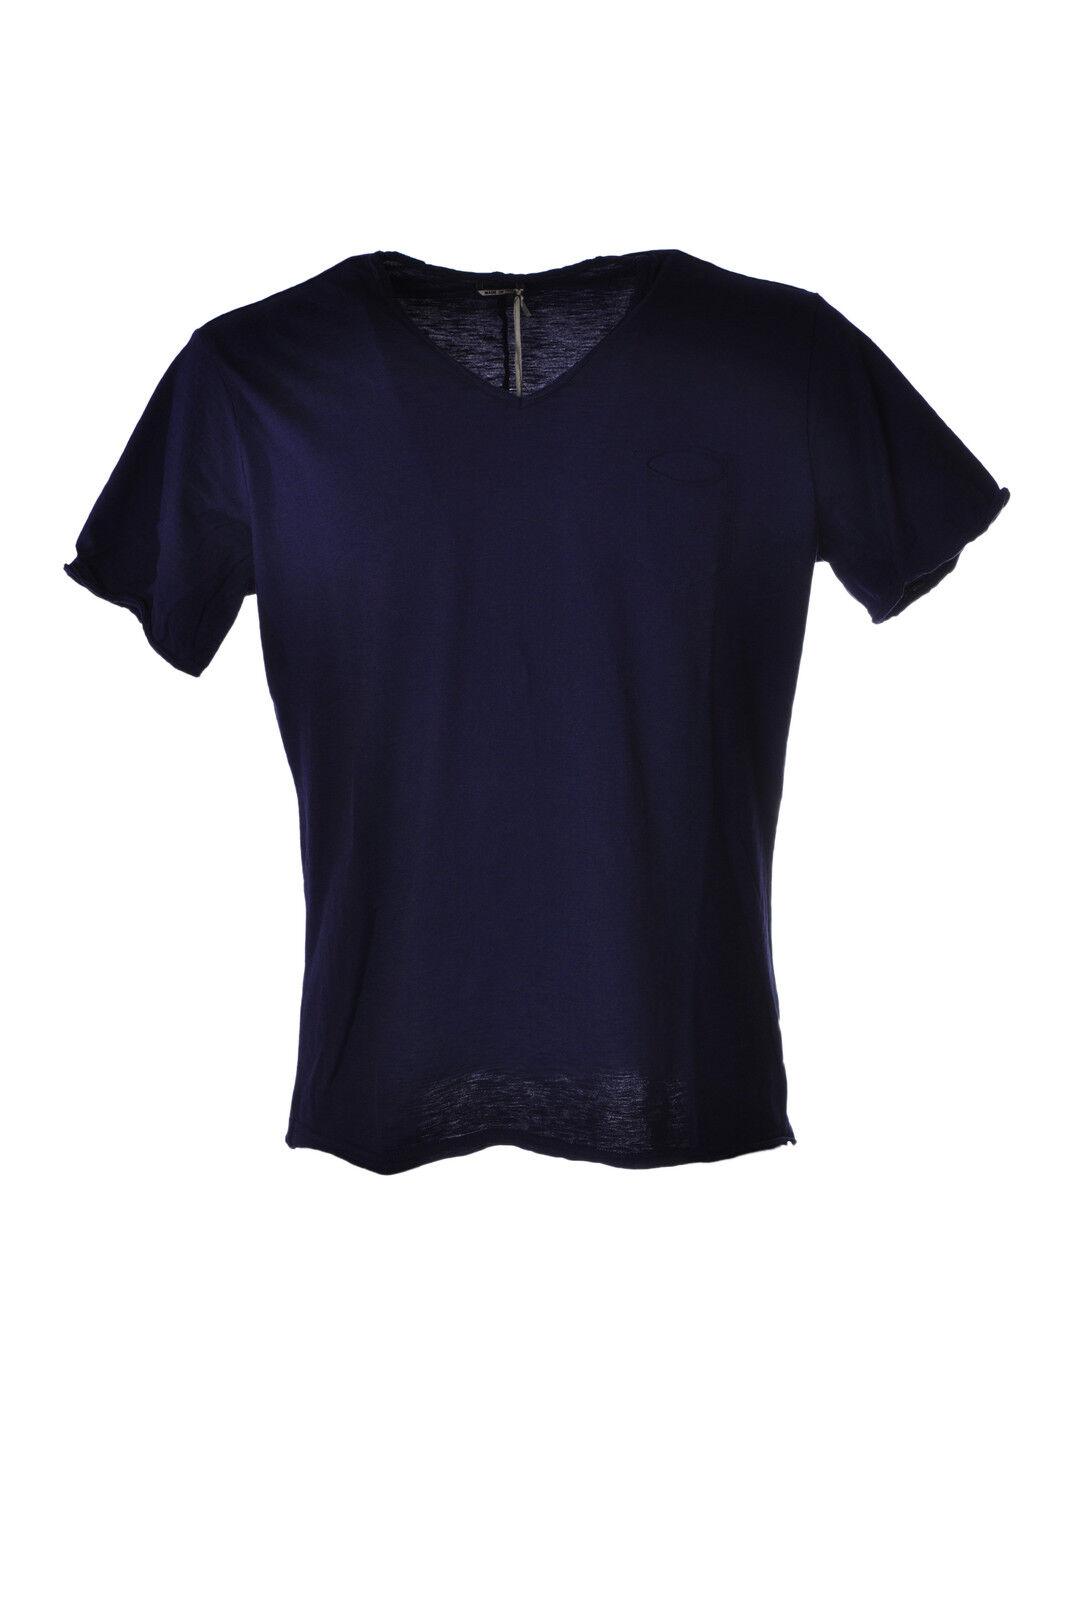 Daniele Alessandrini - Topwear-T-shirts - Mann - blue - 3125615G183925